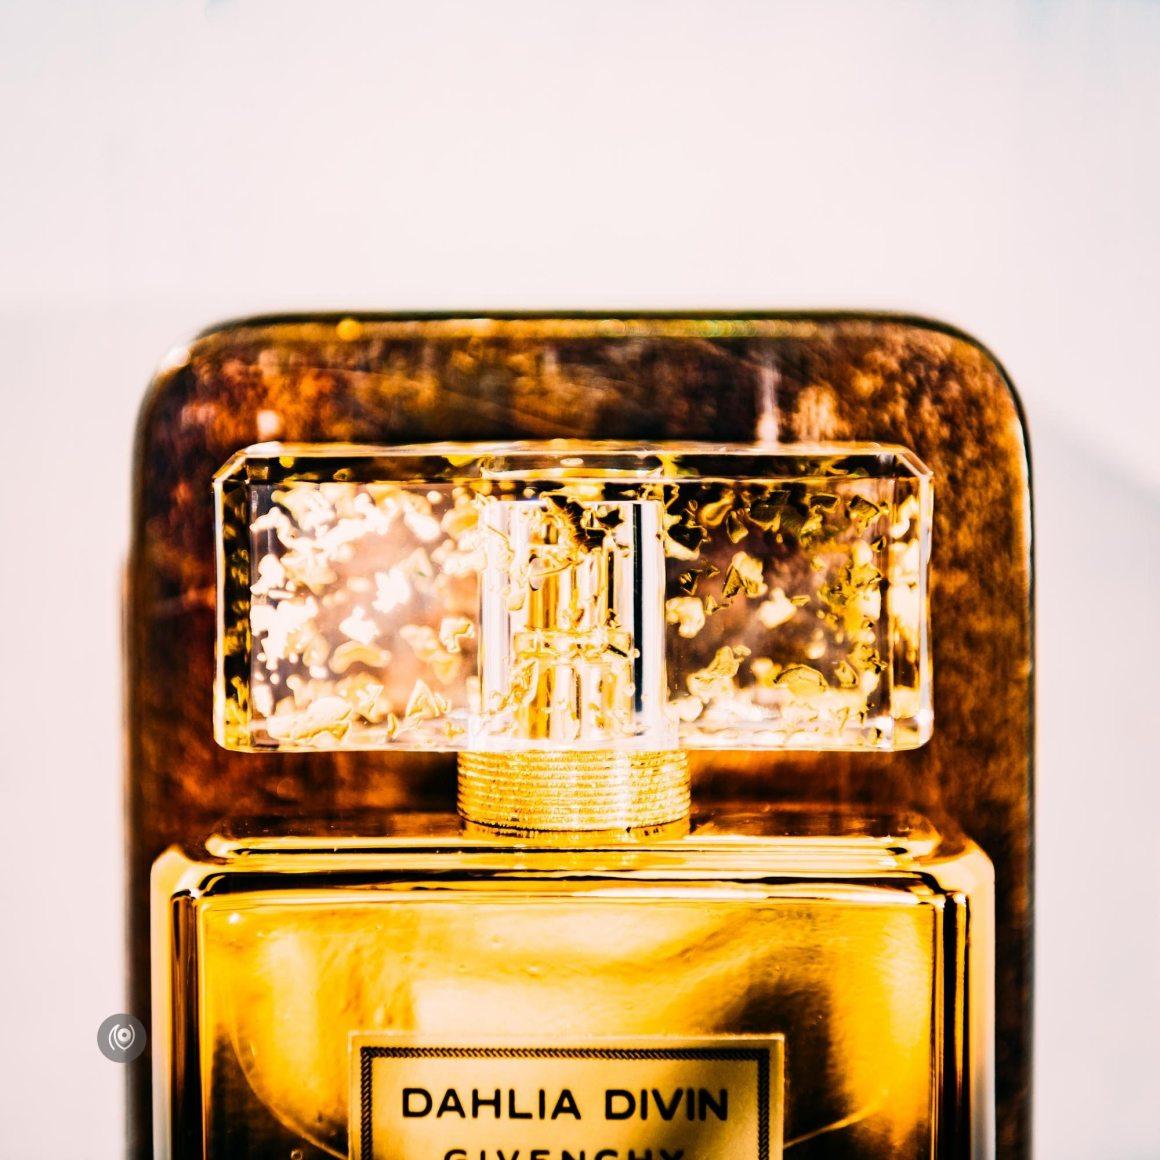 Naina.co, Visual Storyteller, Luxury Brands, Naina Redhu, Professional Photographer, Experience Collector, Luxury Photographer, Luxury Blogger, Lifestyle, Visual Storyteller for Luxury Brands, Parfumier, Parfum, Fragrance, Perfume, Scent, #FragranceOfTheMonth, FragranceOfTheMonth, Fragrance Of The Month, EyesForLuxury, EyesForBeauty, Luxury Blogger, Lifestyle Blogger, Luxury Photographer India, Lifestyle Photographer India, Luxury Blogger India, Lifestyle Blogger India, Fragrance Blogger India, Fragrance Photographer, Fragrance Blogger, Perfume Photographer, Product Photographer, Product Blogger, Perfume Photographer, Fragrance Market India, Dahlia Divin, Le Nectar, Dahlia Divin Le Nectar, For Women, Givenchy, Warm, Caramel, Tonka Bean, Francois Demachy, Luxurious, Haute Couture, Elixir of Divine Potency, Mimosa, Sambac Jasmine, Sensual, Elegant, Rose, Vetiver, Sandalwood, Lavish, Vanilla Musk, Lacquered Glass, Gold, Creamy